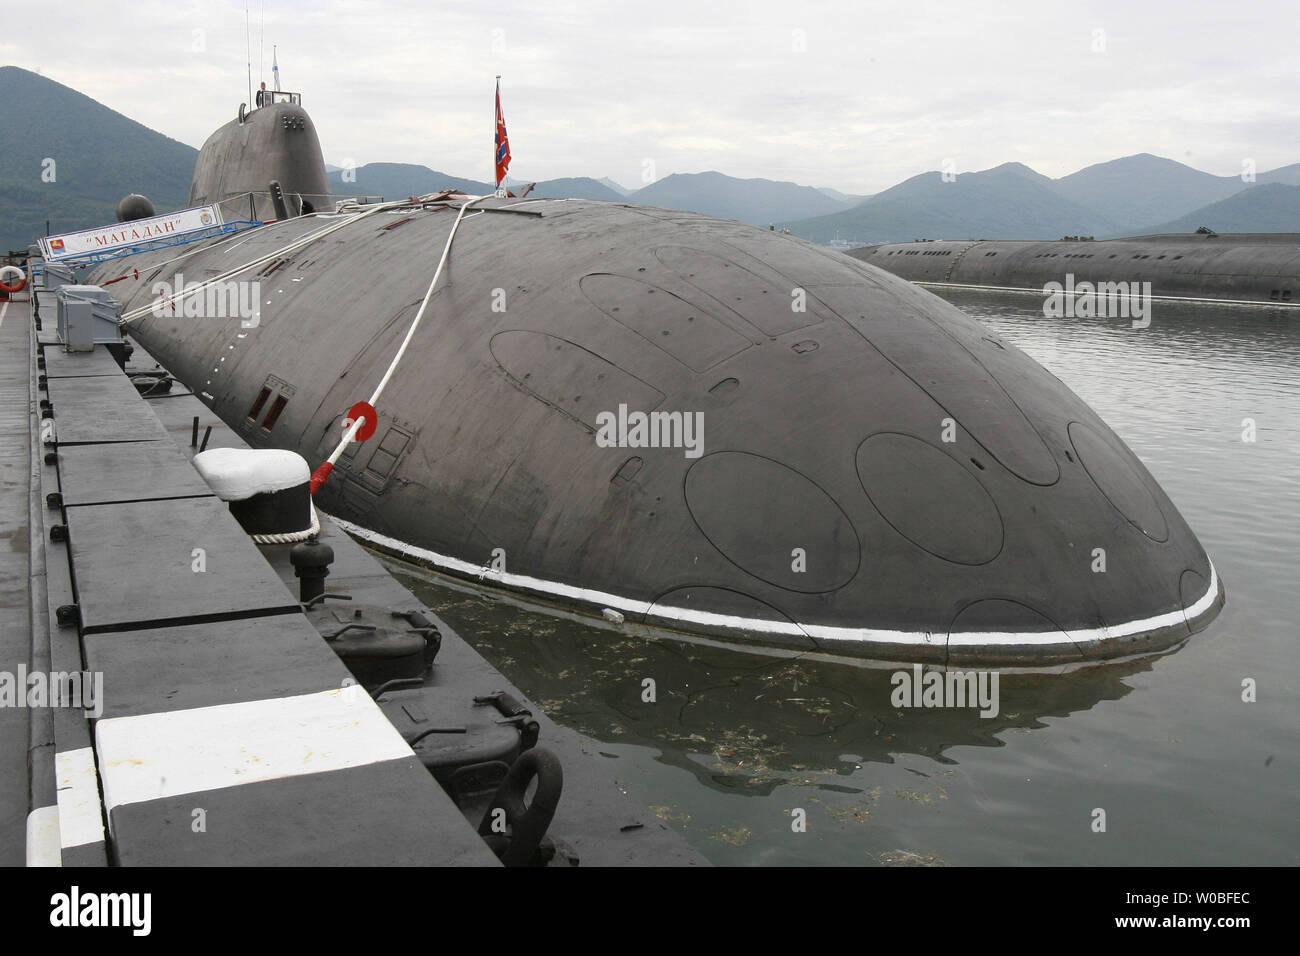 Russian nuclear powered submarine 'Magadan' is at a pier at the Vilyuchinsk military base at the Kamchatka Peninsula at Russian Far East on September 5, 2007. (UPI Photo/Anatoli Zhdanov) - Stock Image